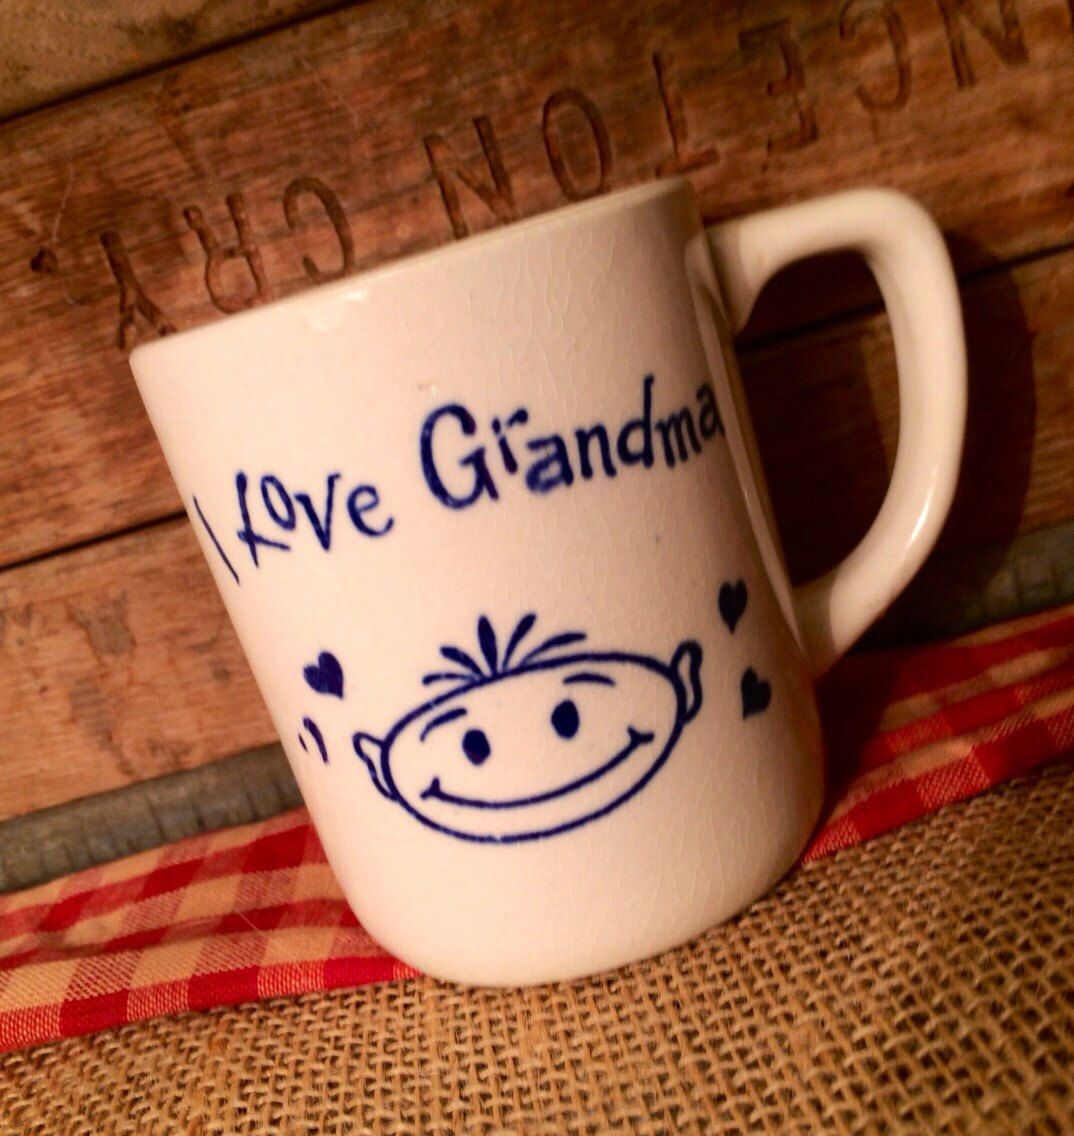 grandma's gift shop location